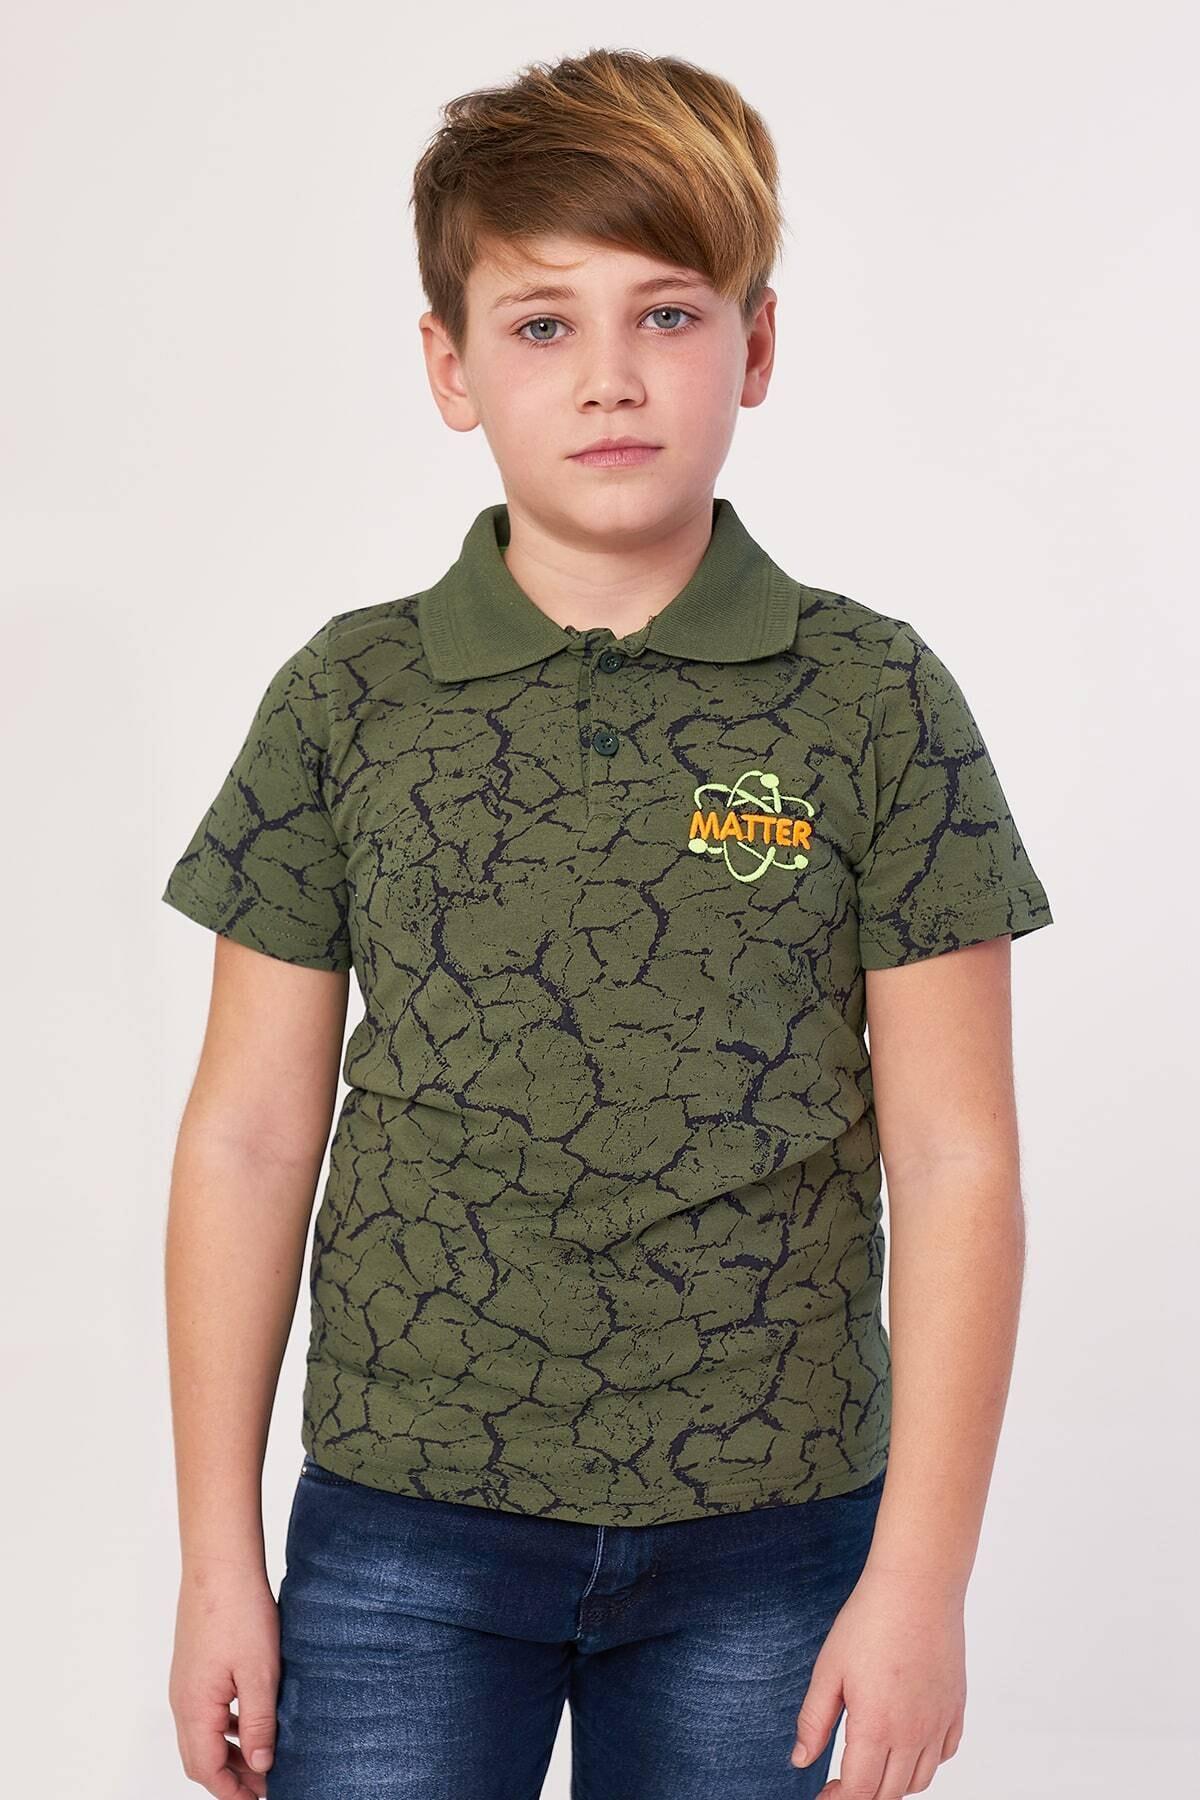 Erkek Çocuk Haki Polo Yaka T-shirt Matter Nakışlı 3-12 Yaş